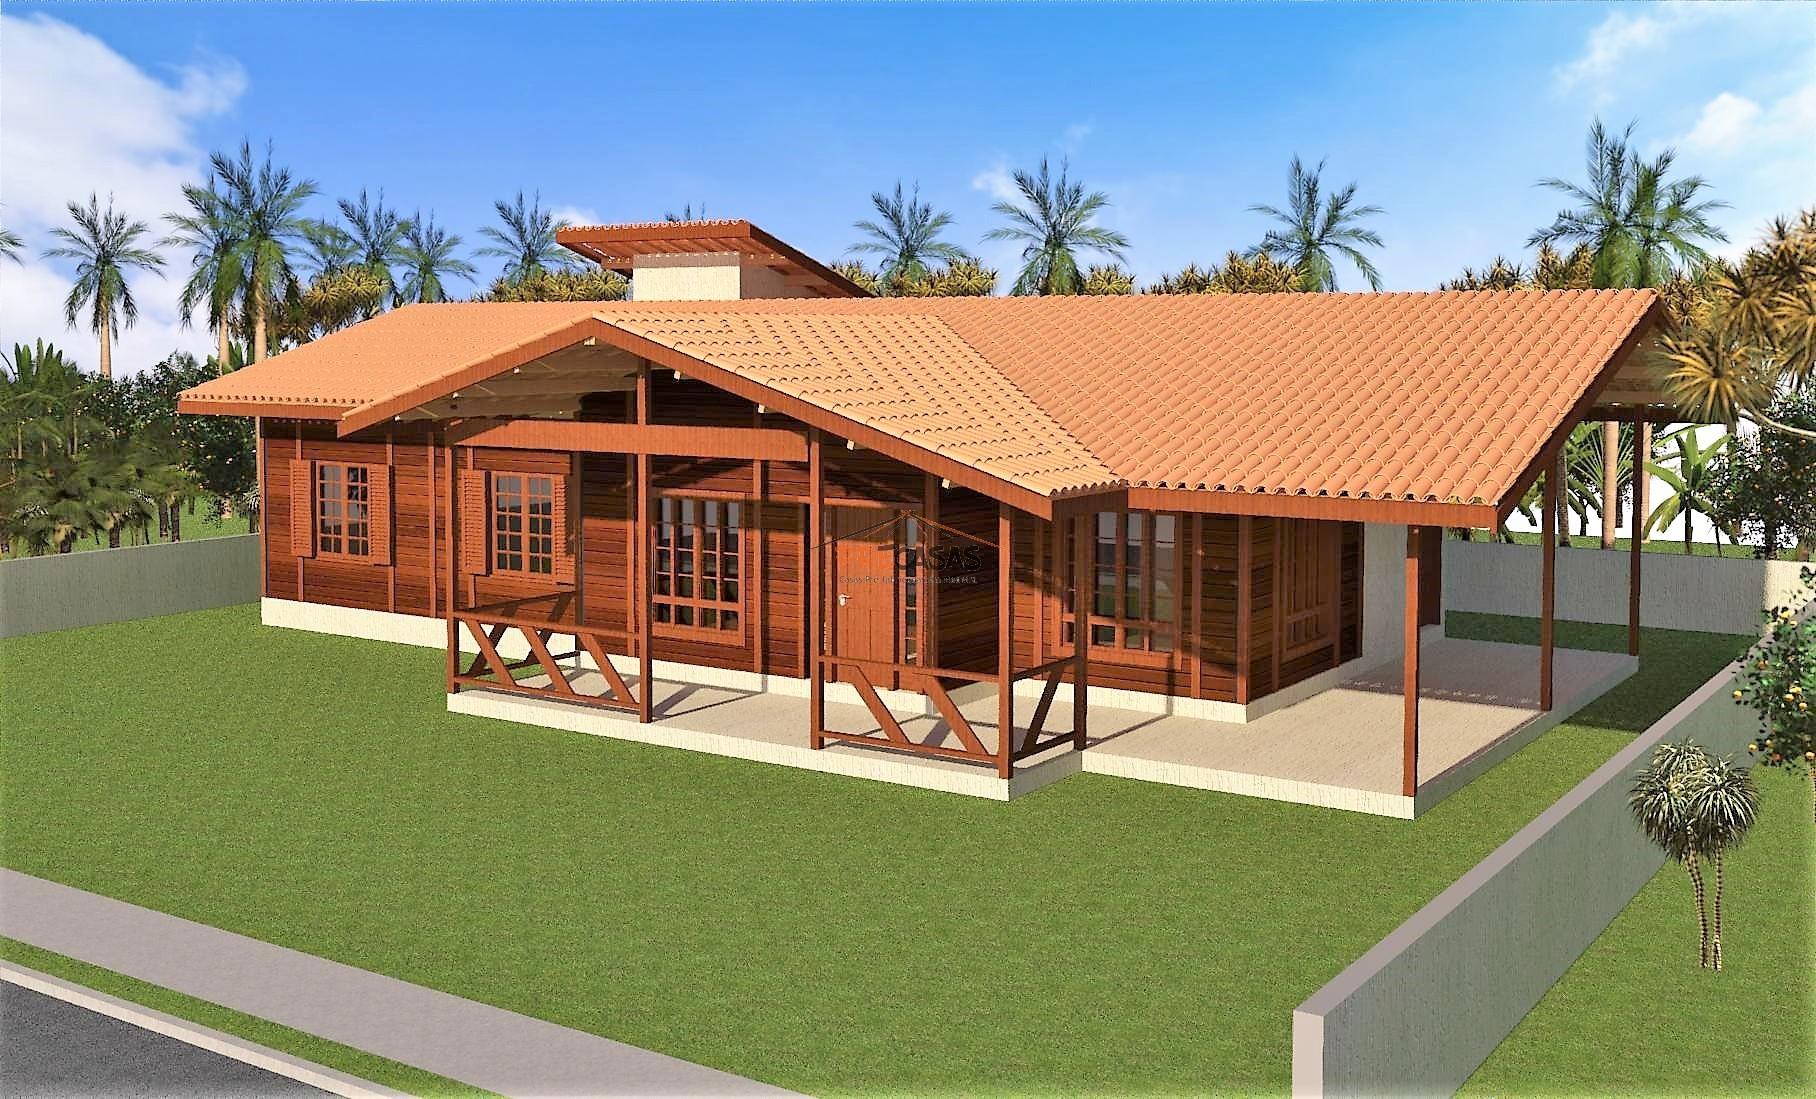 Casa de Madeira – Guarapari-ES - 164,00 m²